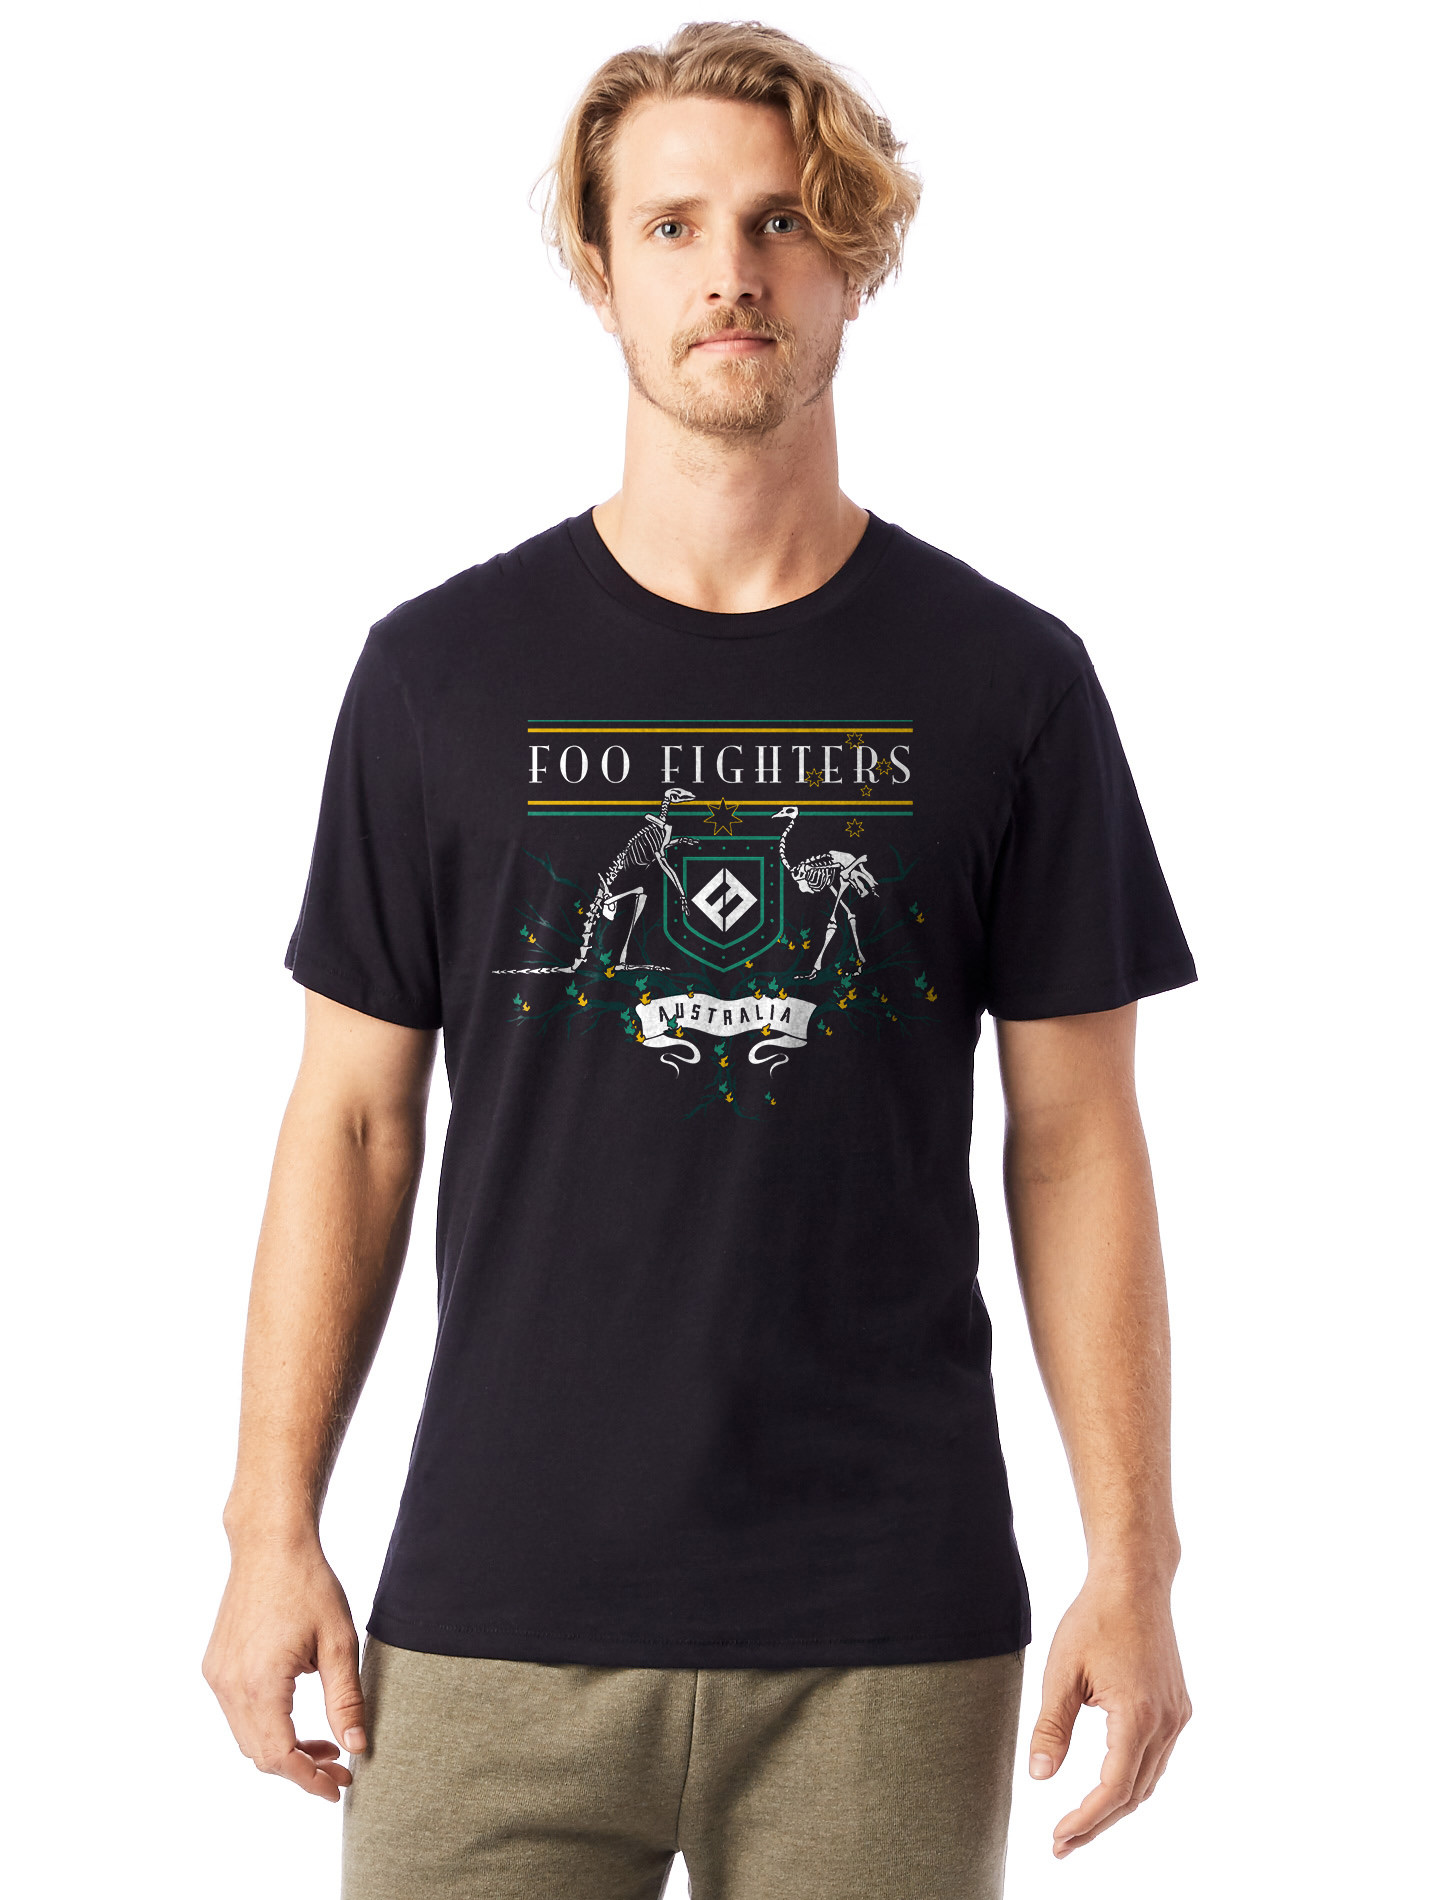 foo-fighters-australia-model.jpg